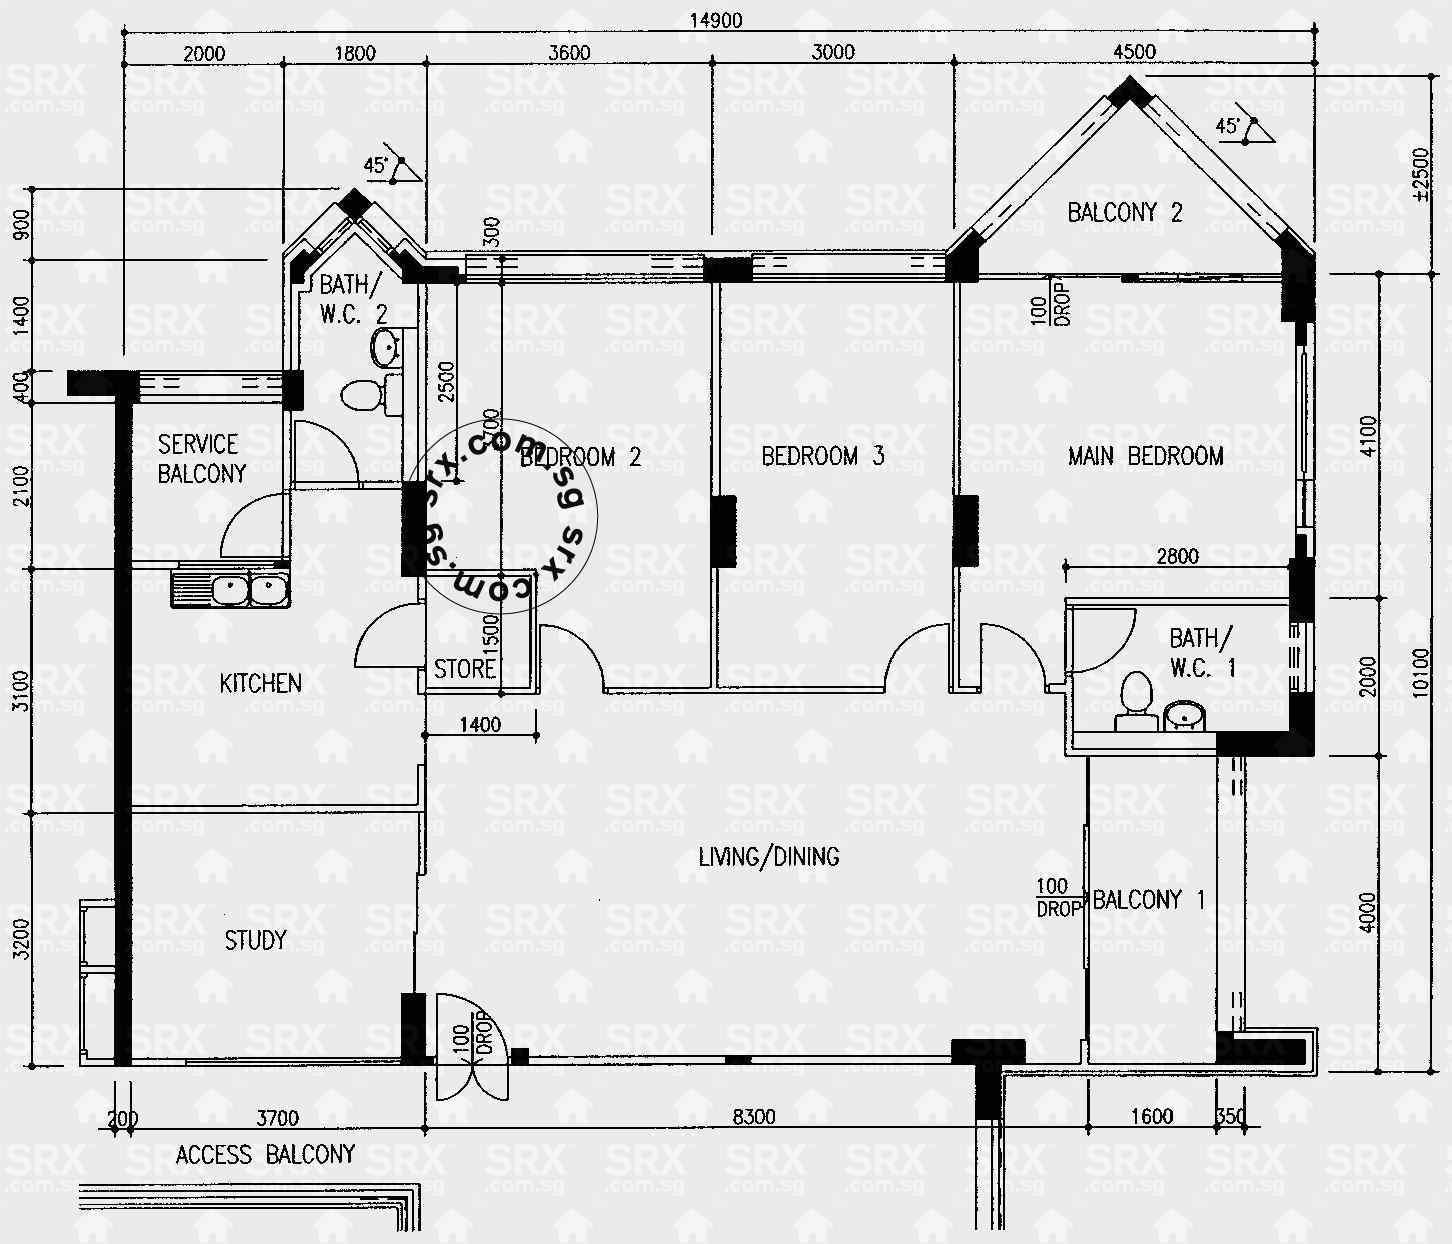 Pasir ris street 72 hdb details srx property for 509 plans